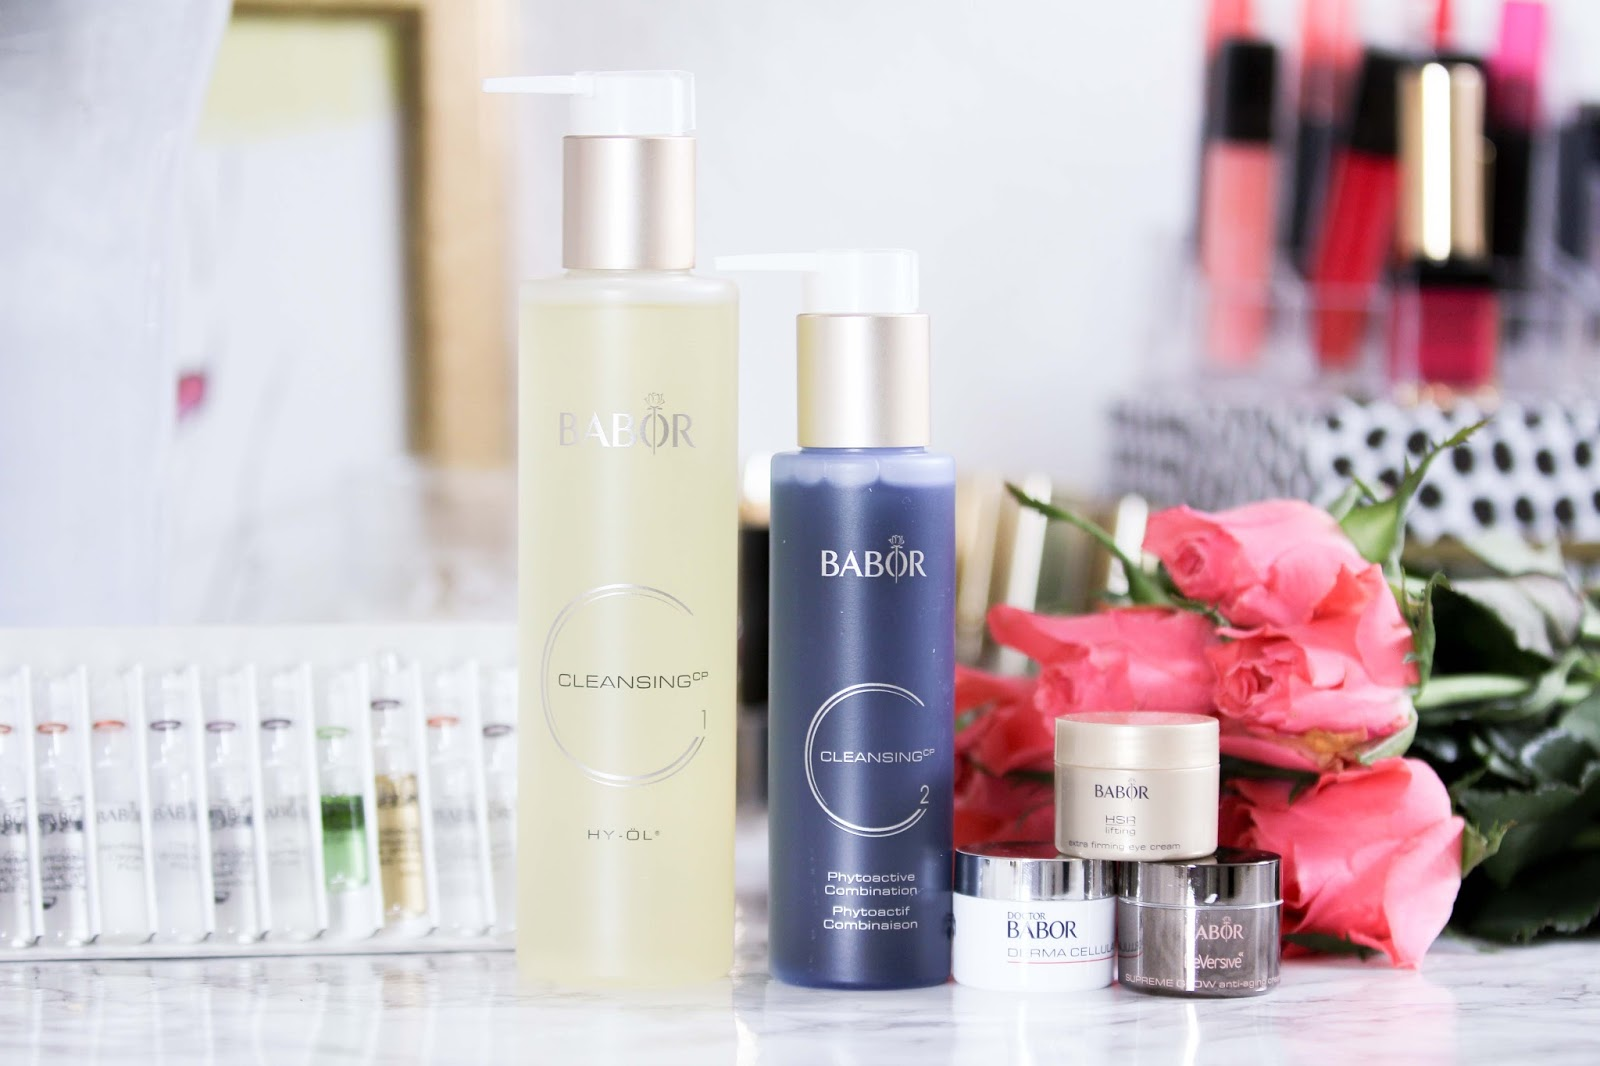 Barbor-Beautyblogger-Haut+Plus Kosmetik Institut Frankfurt-Frankfurt-Kosmetik-Insitut-Frankfurt-Kosmetikstudio-Kosmetikinstitut